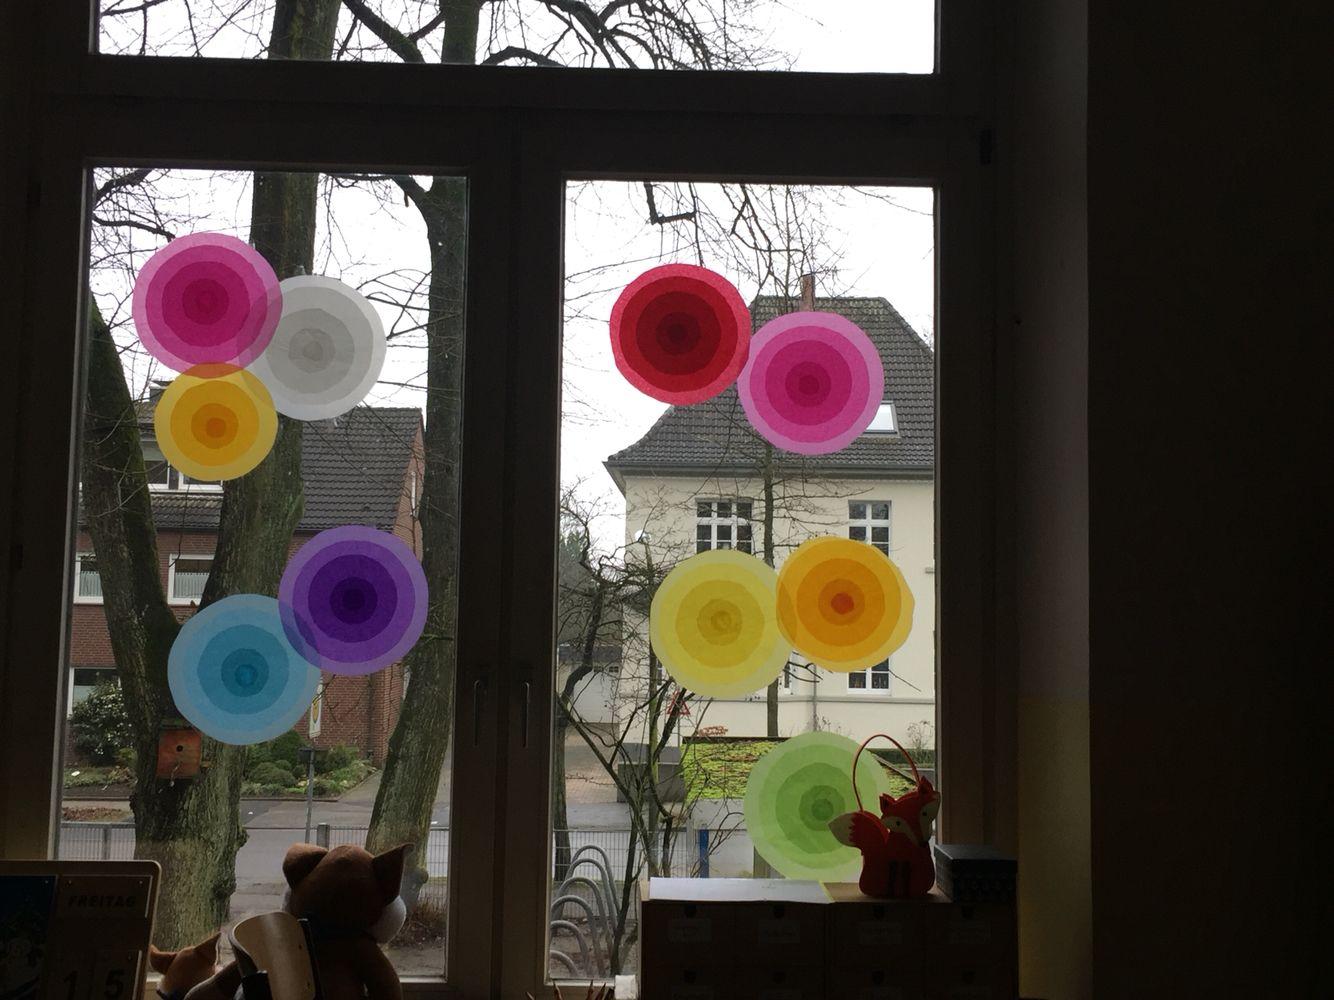 Faschingsdeko Fur Fenster Fasching Fotoideen Kita Kindergarten